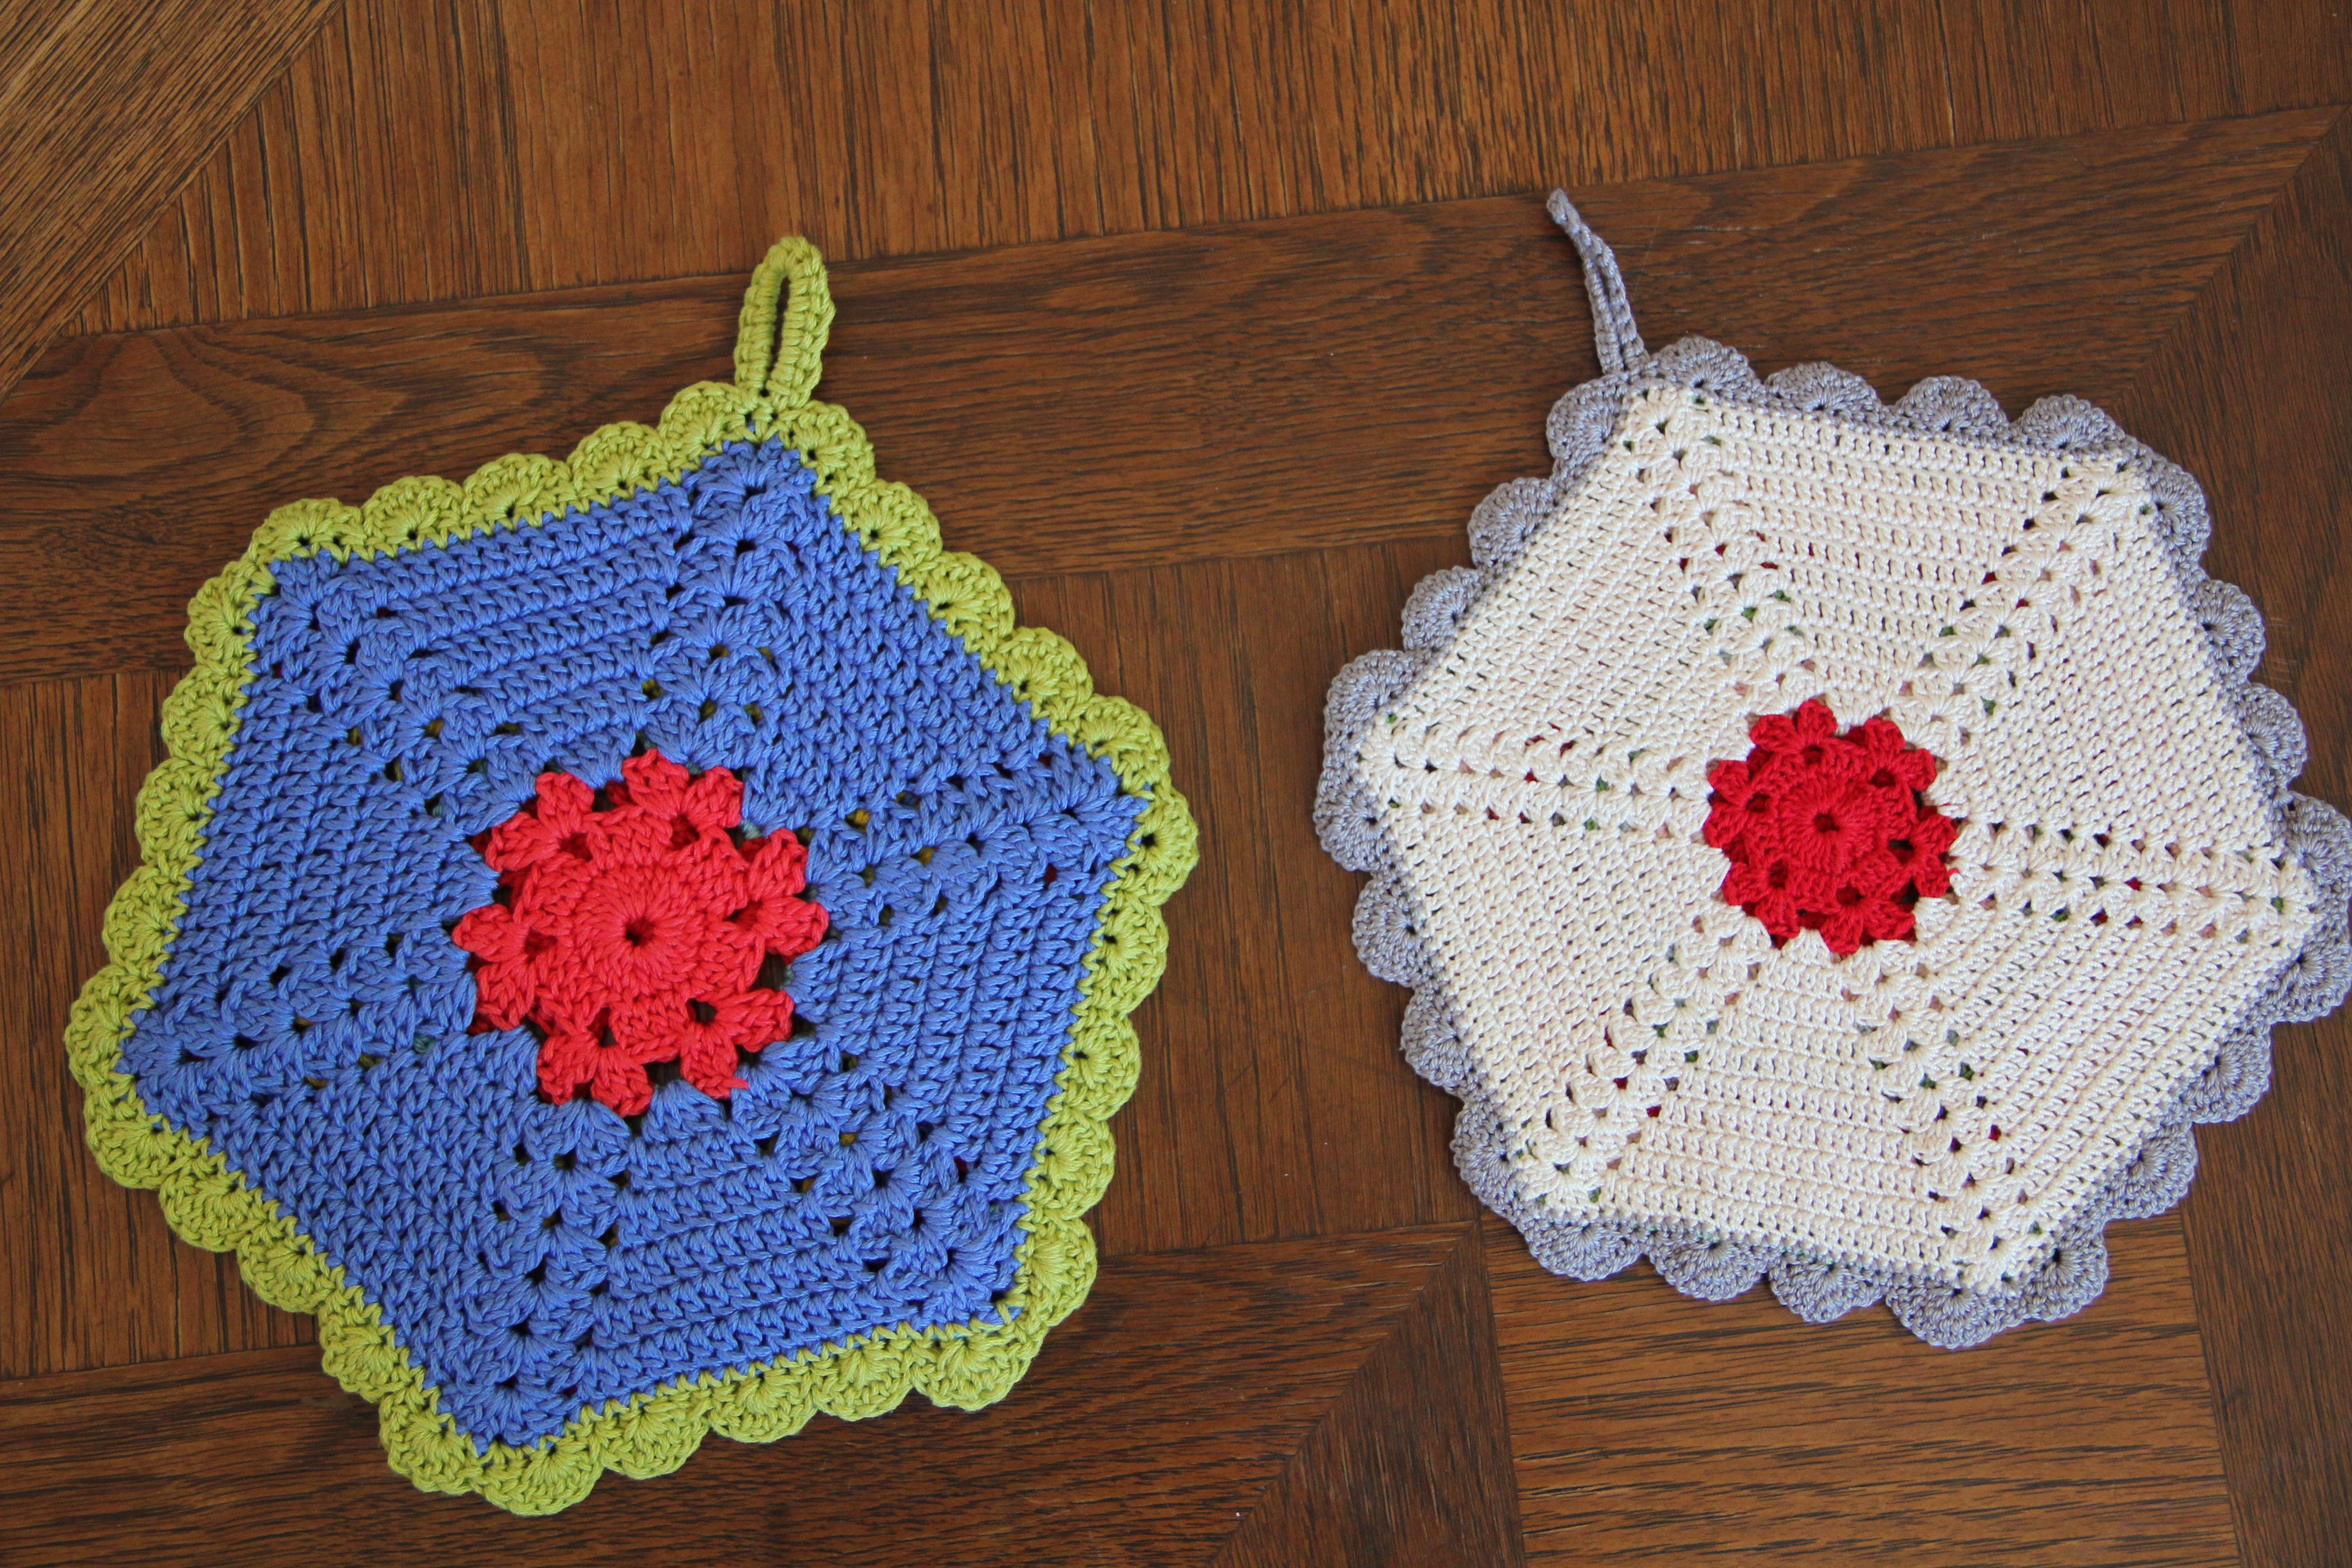 Free Vintage Crochet Potholder Patterns